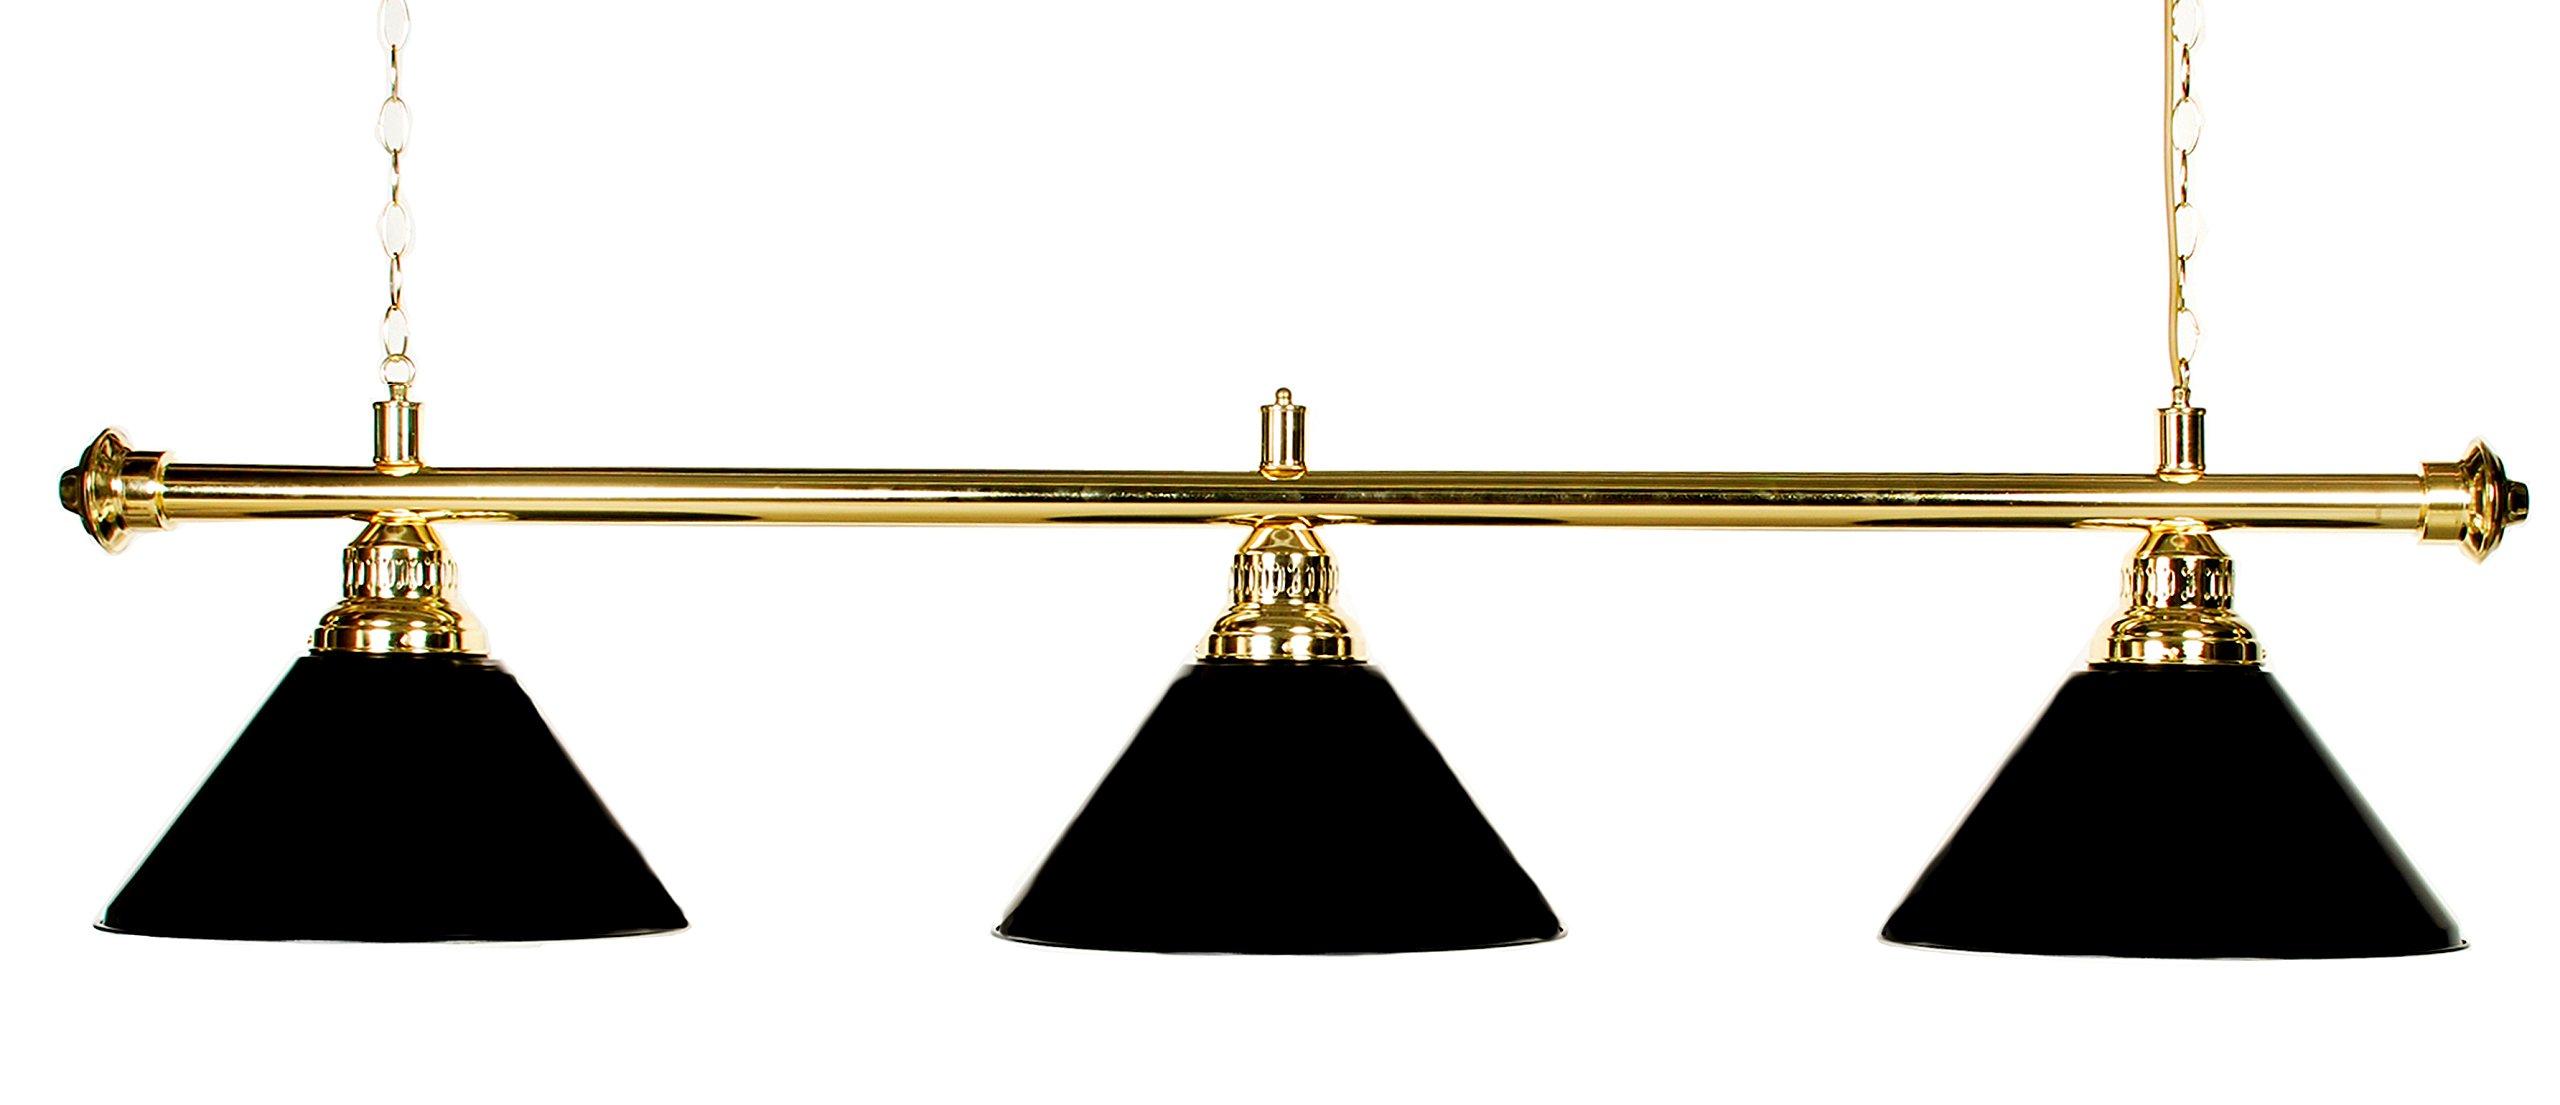 "61"" Pool Table Light - Billiard Lamp Brass Rod Choose Burgandy, Green or Black Metal Shades (brass black)"